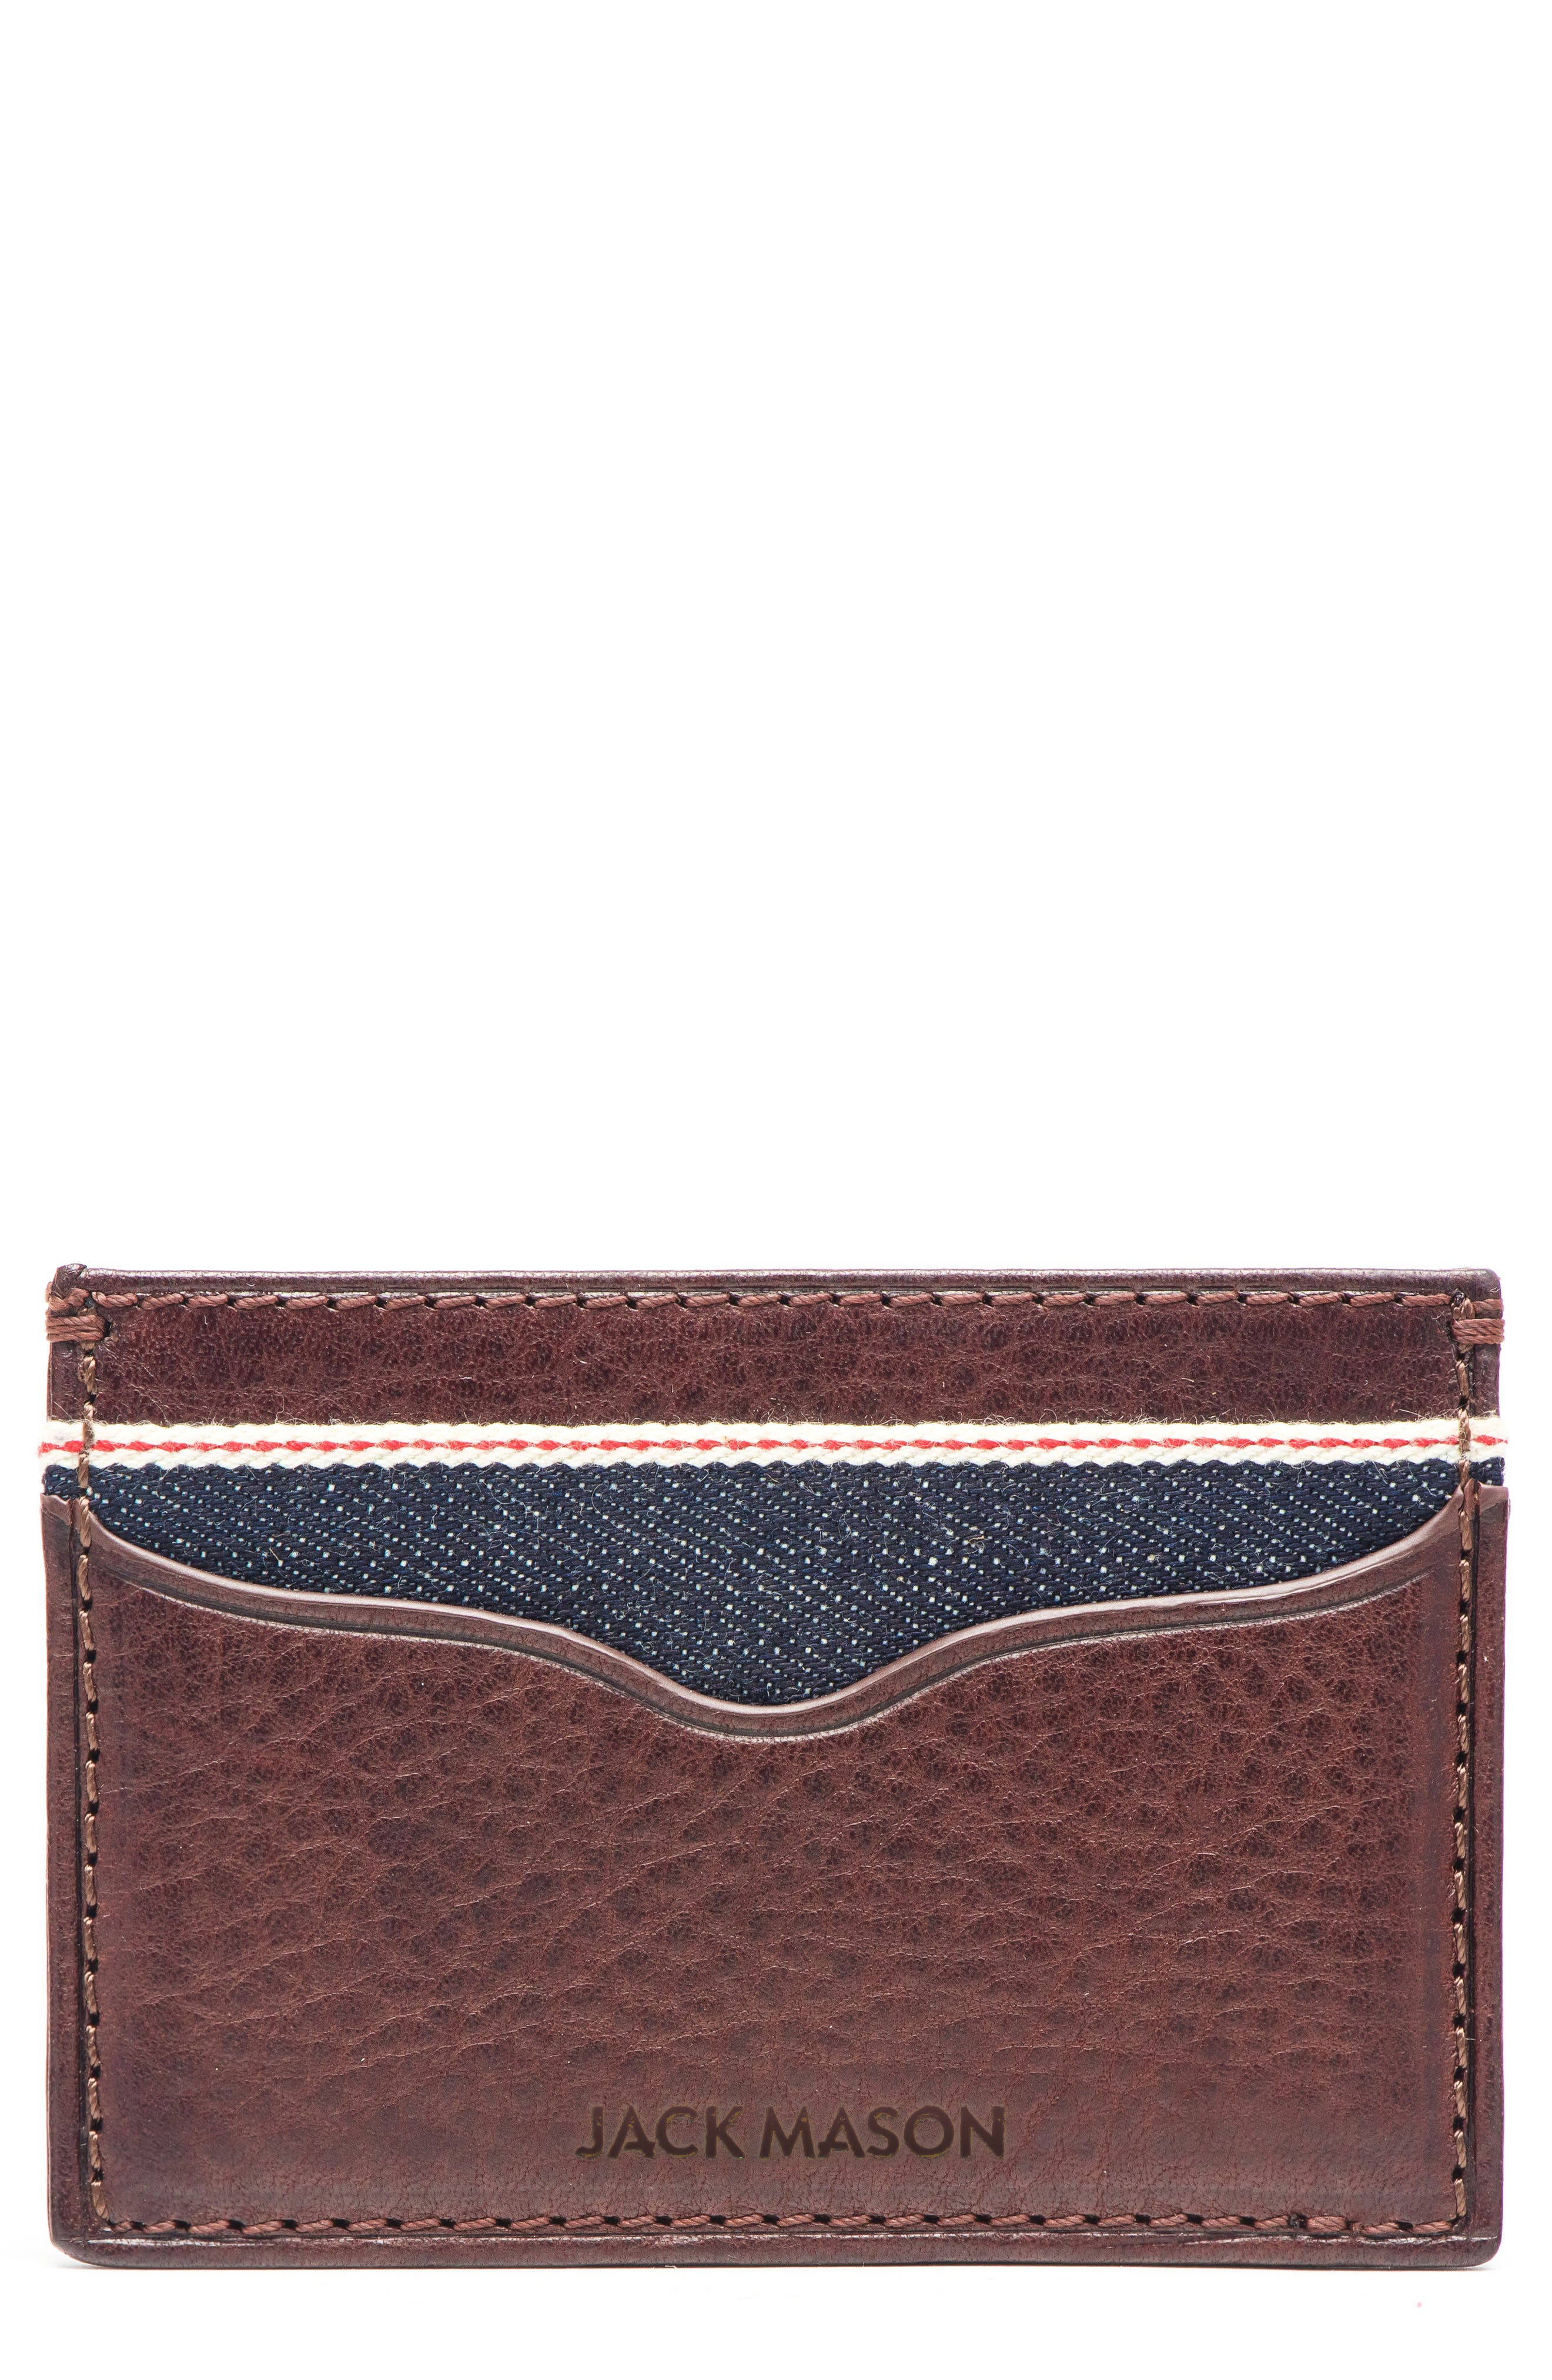 Leather & Denim Card Case,                         Main,                         color, 200